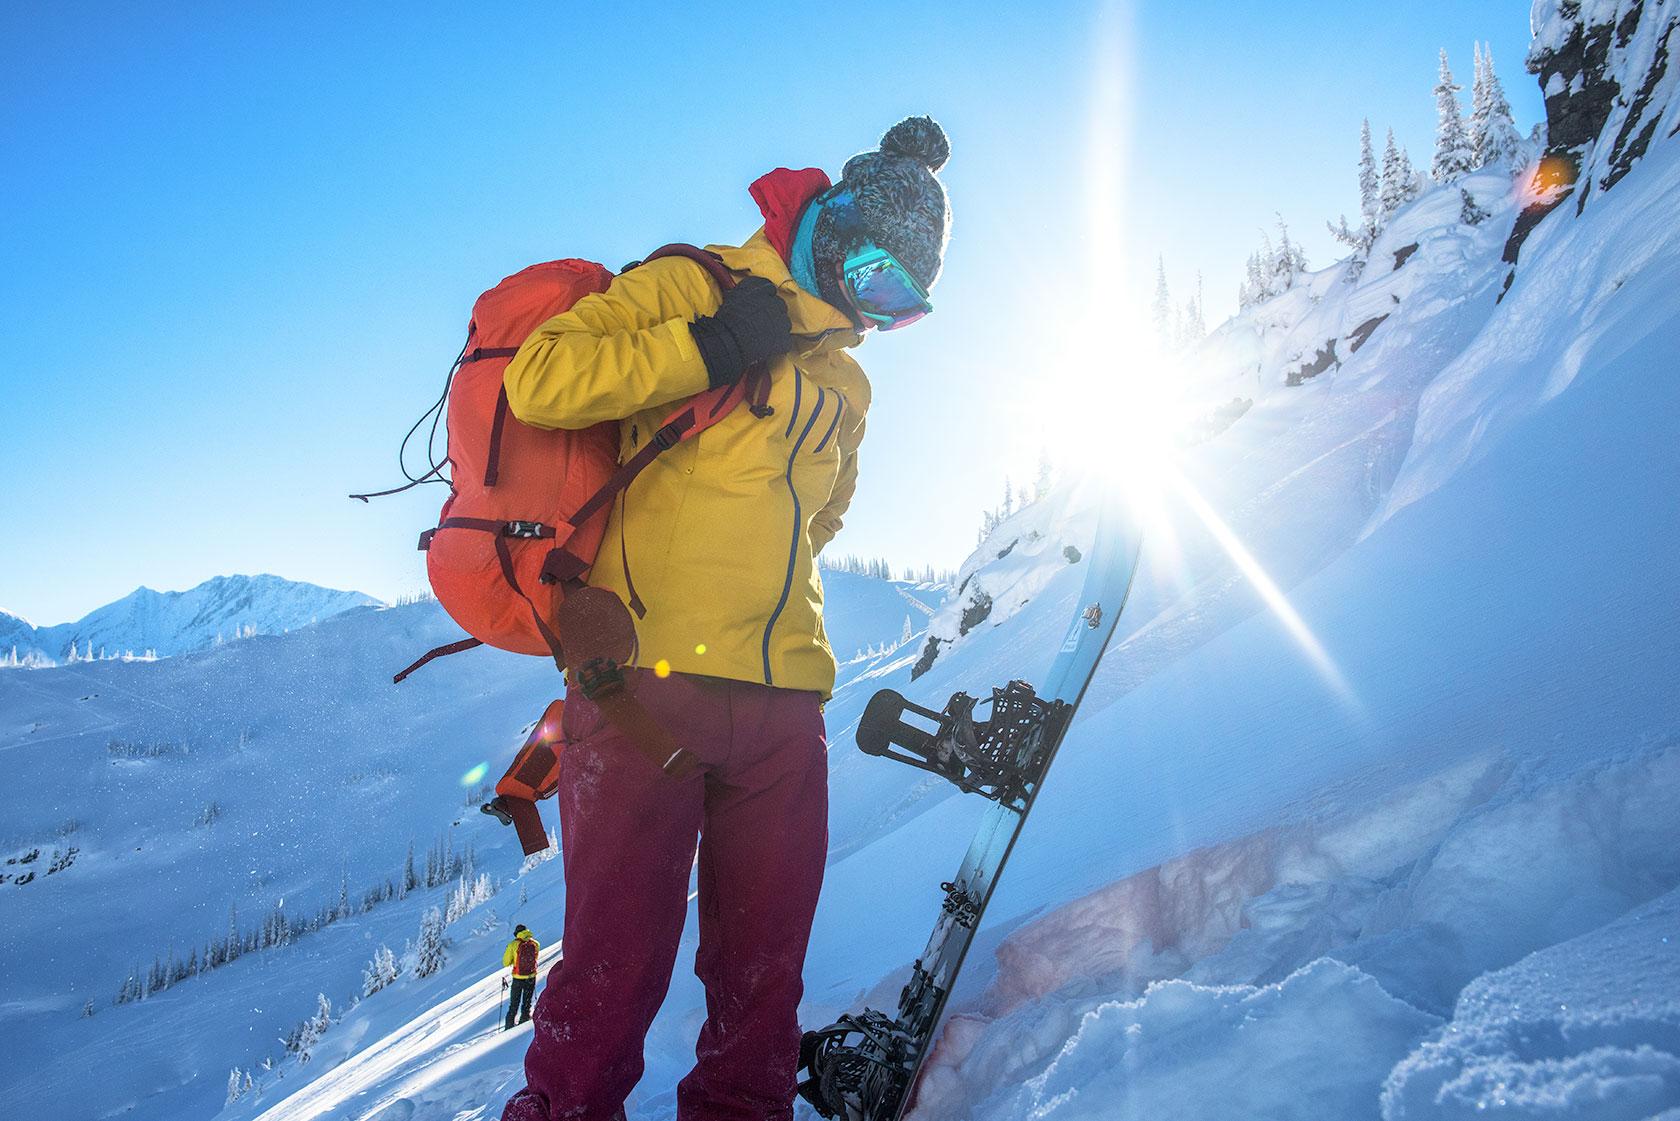 austin-trigg-patagonia-banff-alberta-winter-rogers-pass-canada-lifestyle-adventure-mountains-splitboard-cloths.jpg